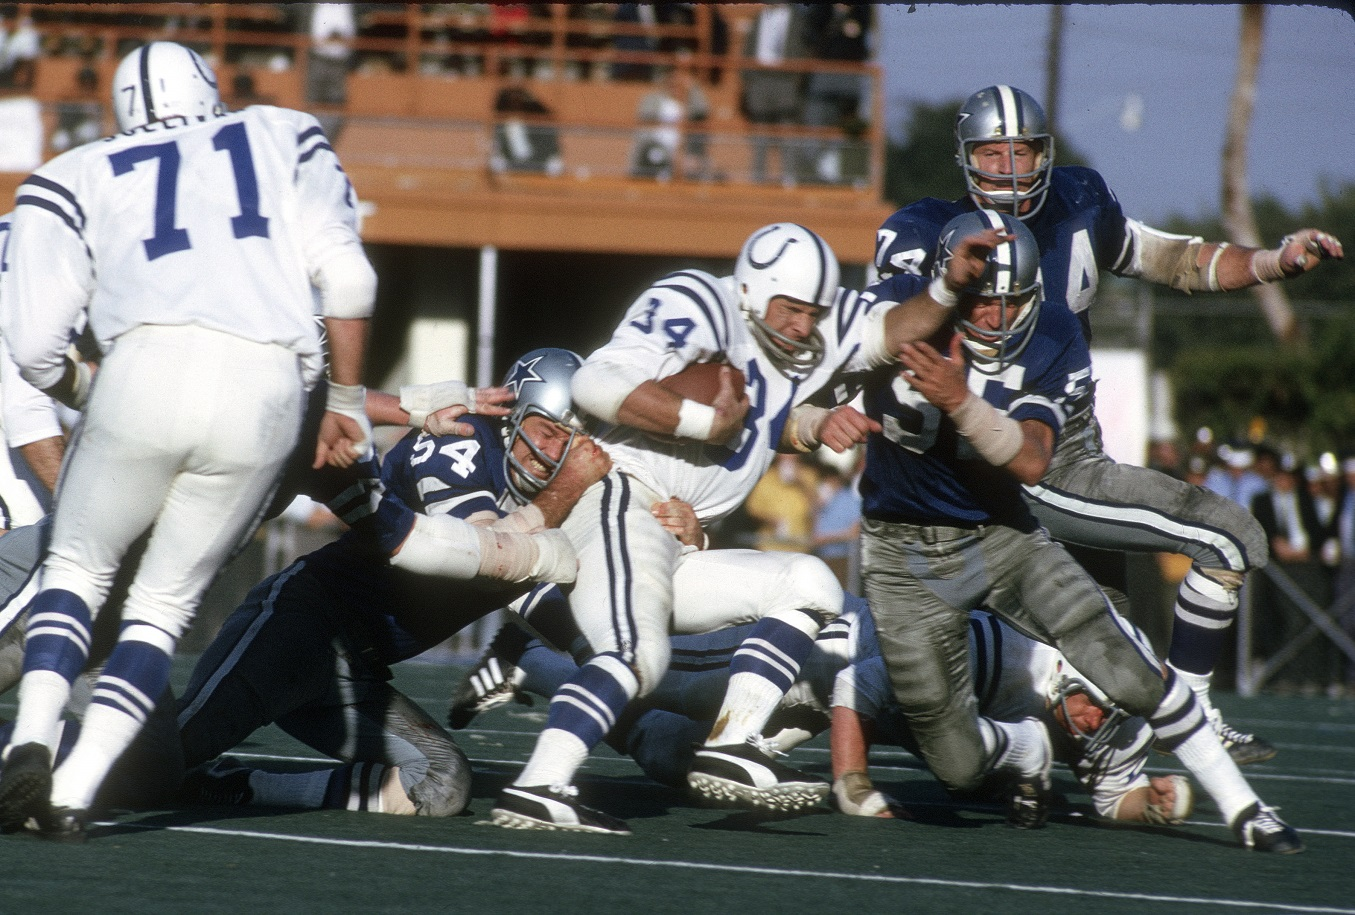 Super Bowl V between the Colts and Cowboys